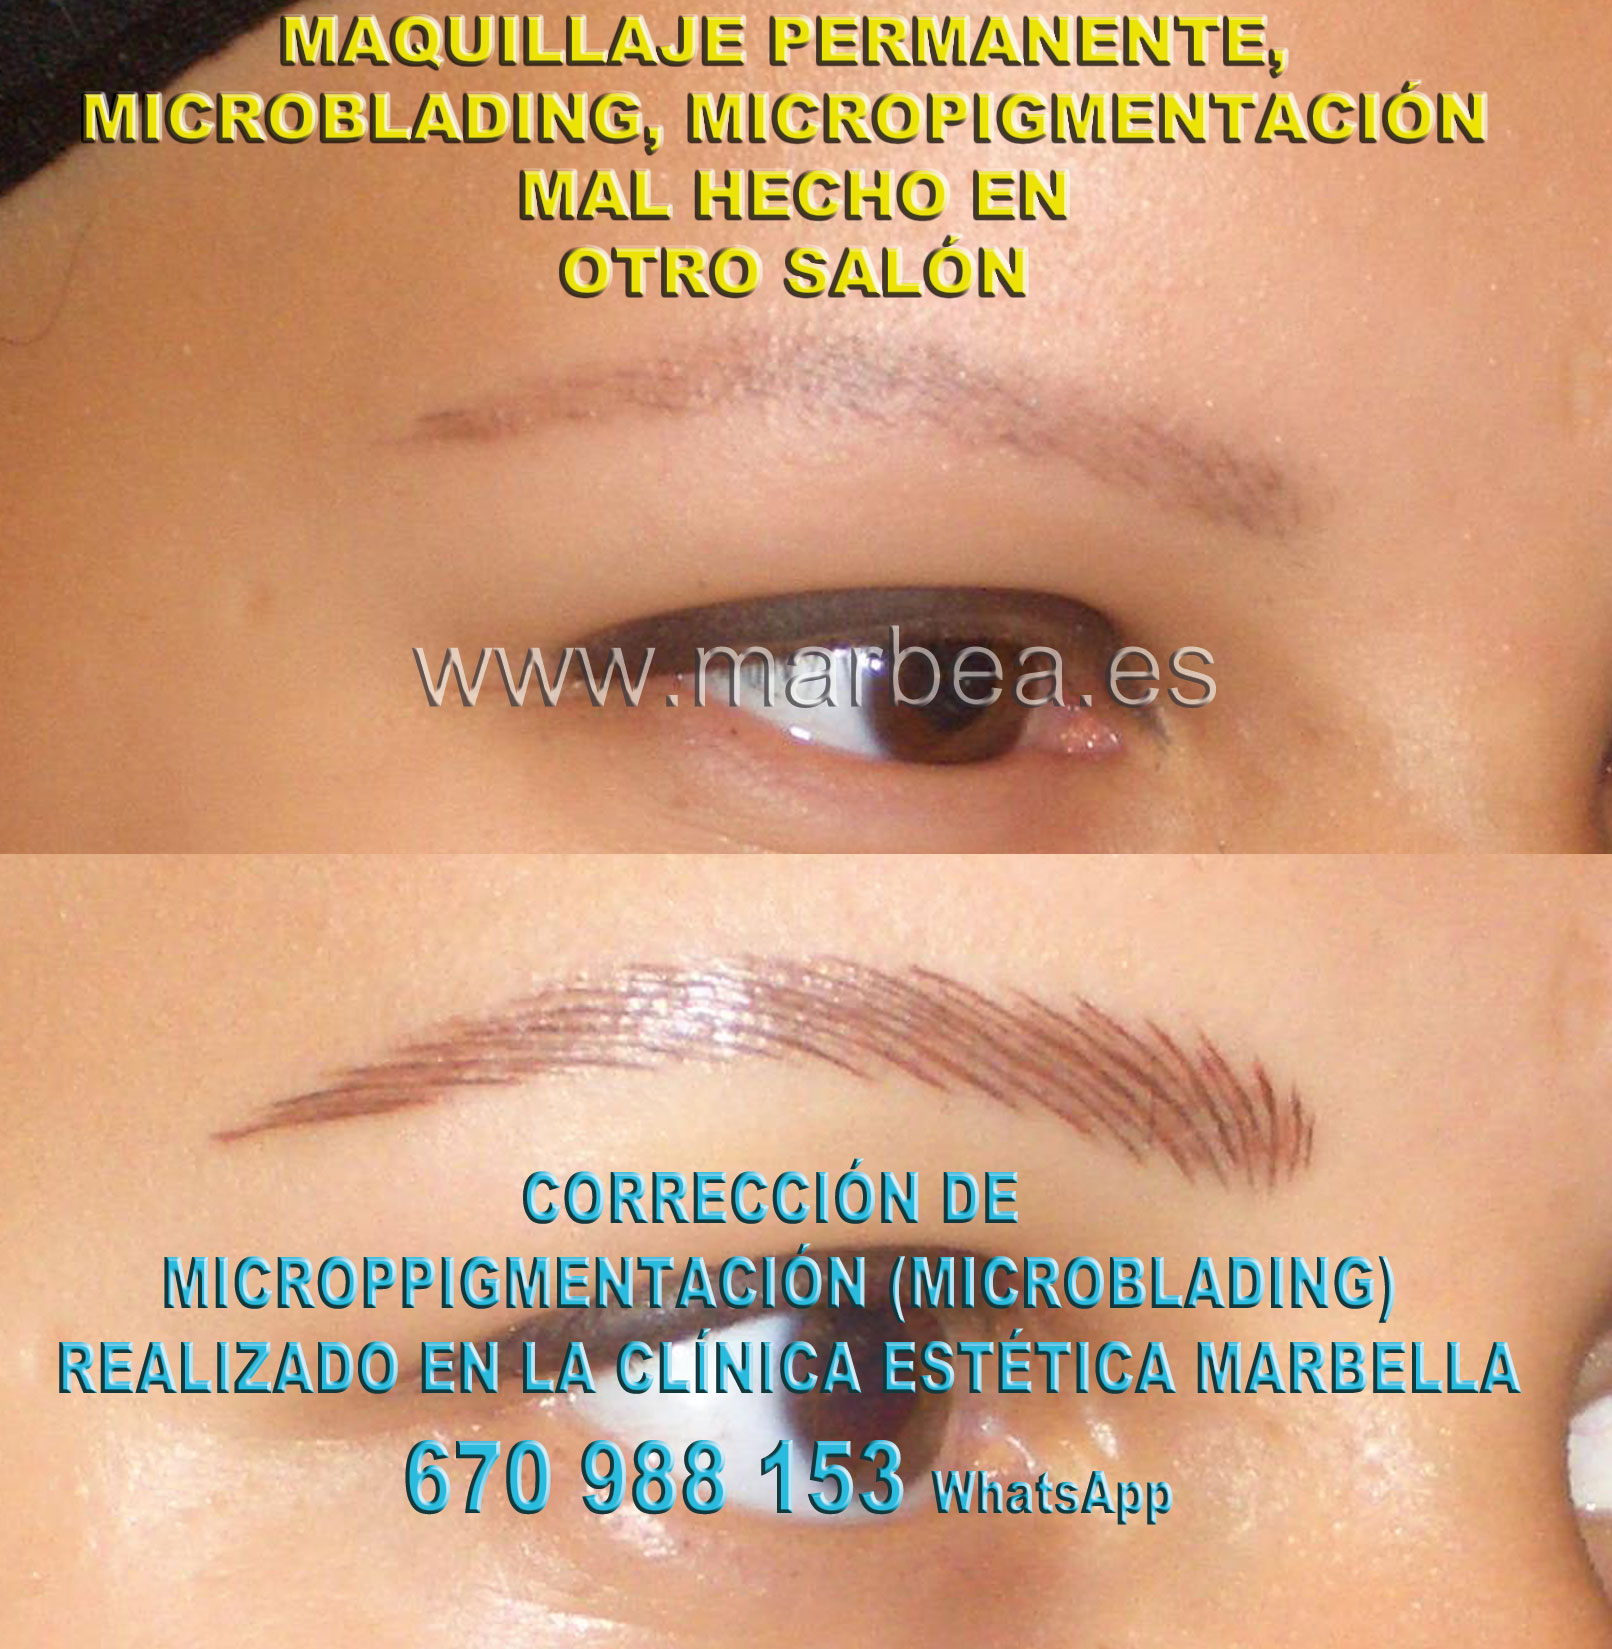 QUITAR TATUAJE CEJAS clínica estética delineados entrega corrección de micropigmentación en cejas,micropigmentación correctiva cejas mal hecha